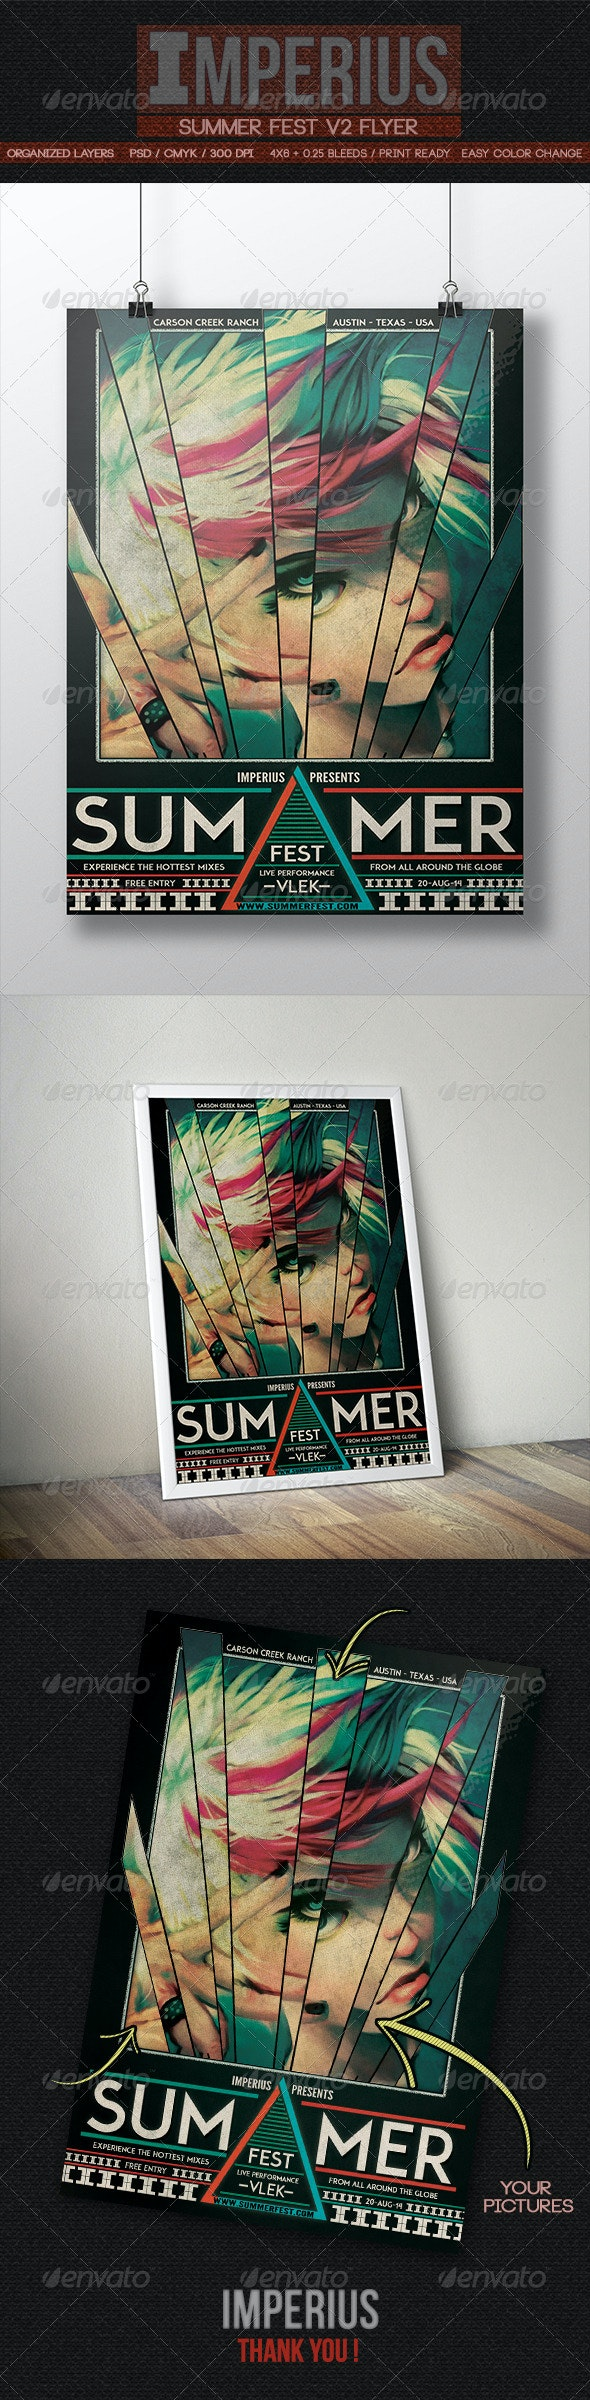 Summer Fest V2 - Flyers Print Templates